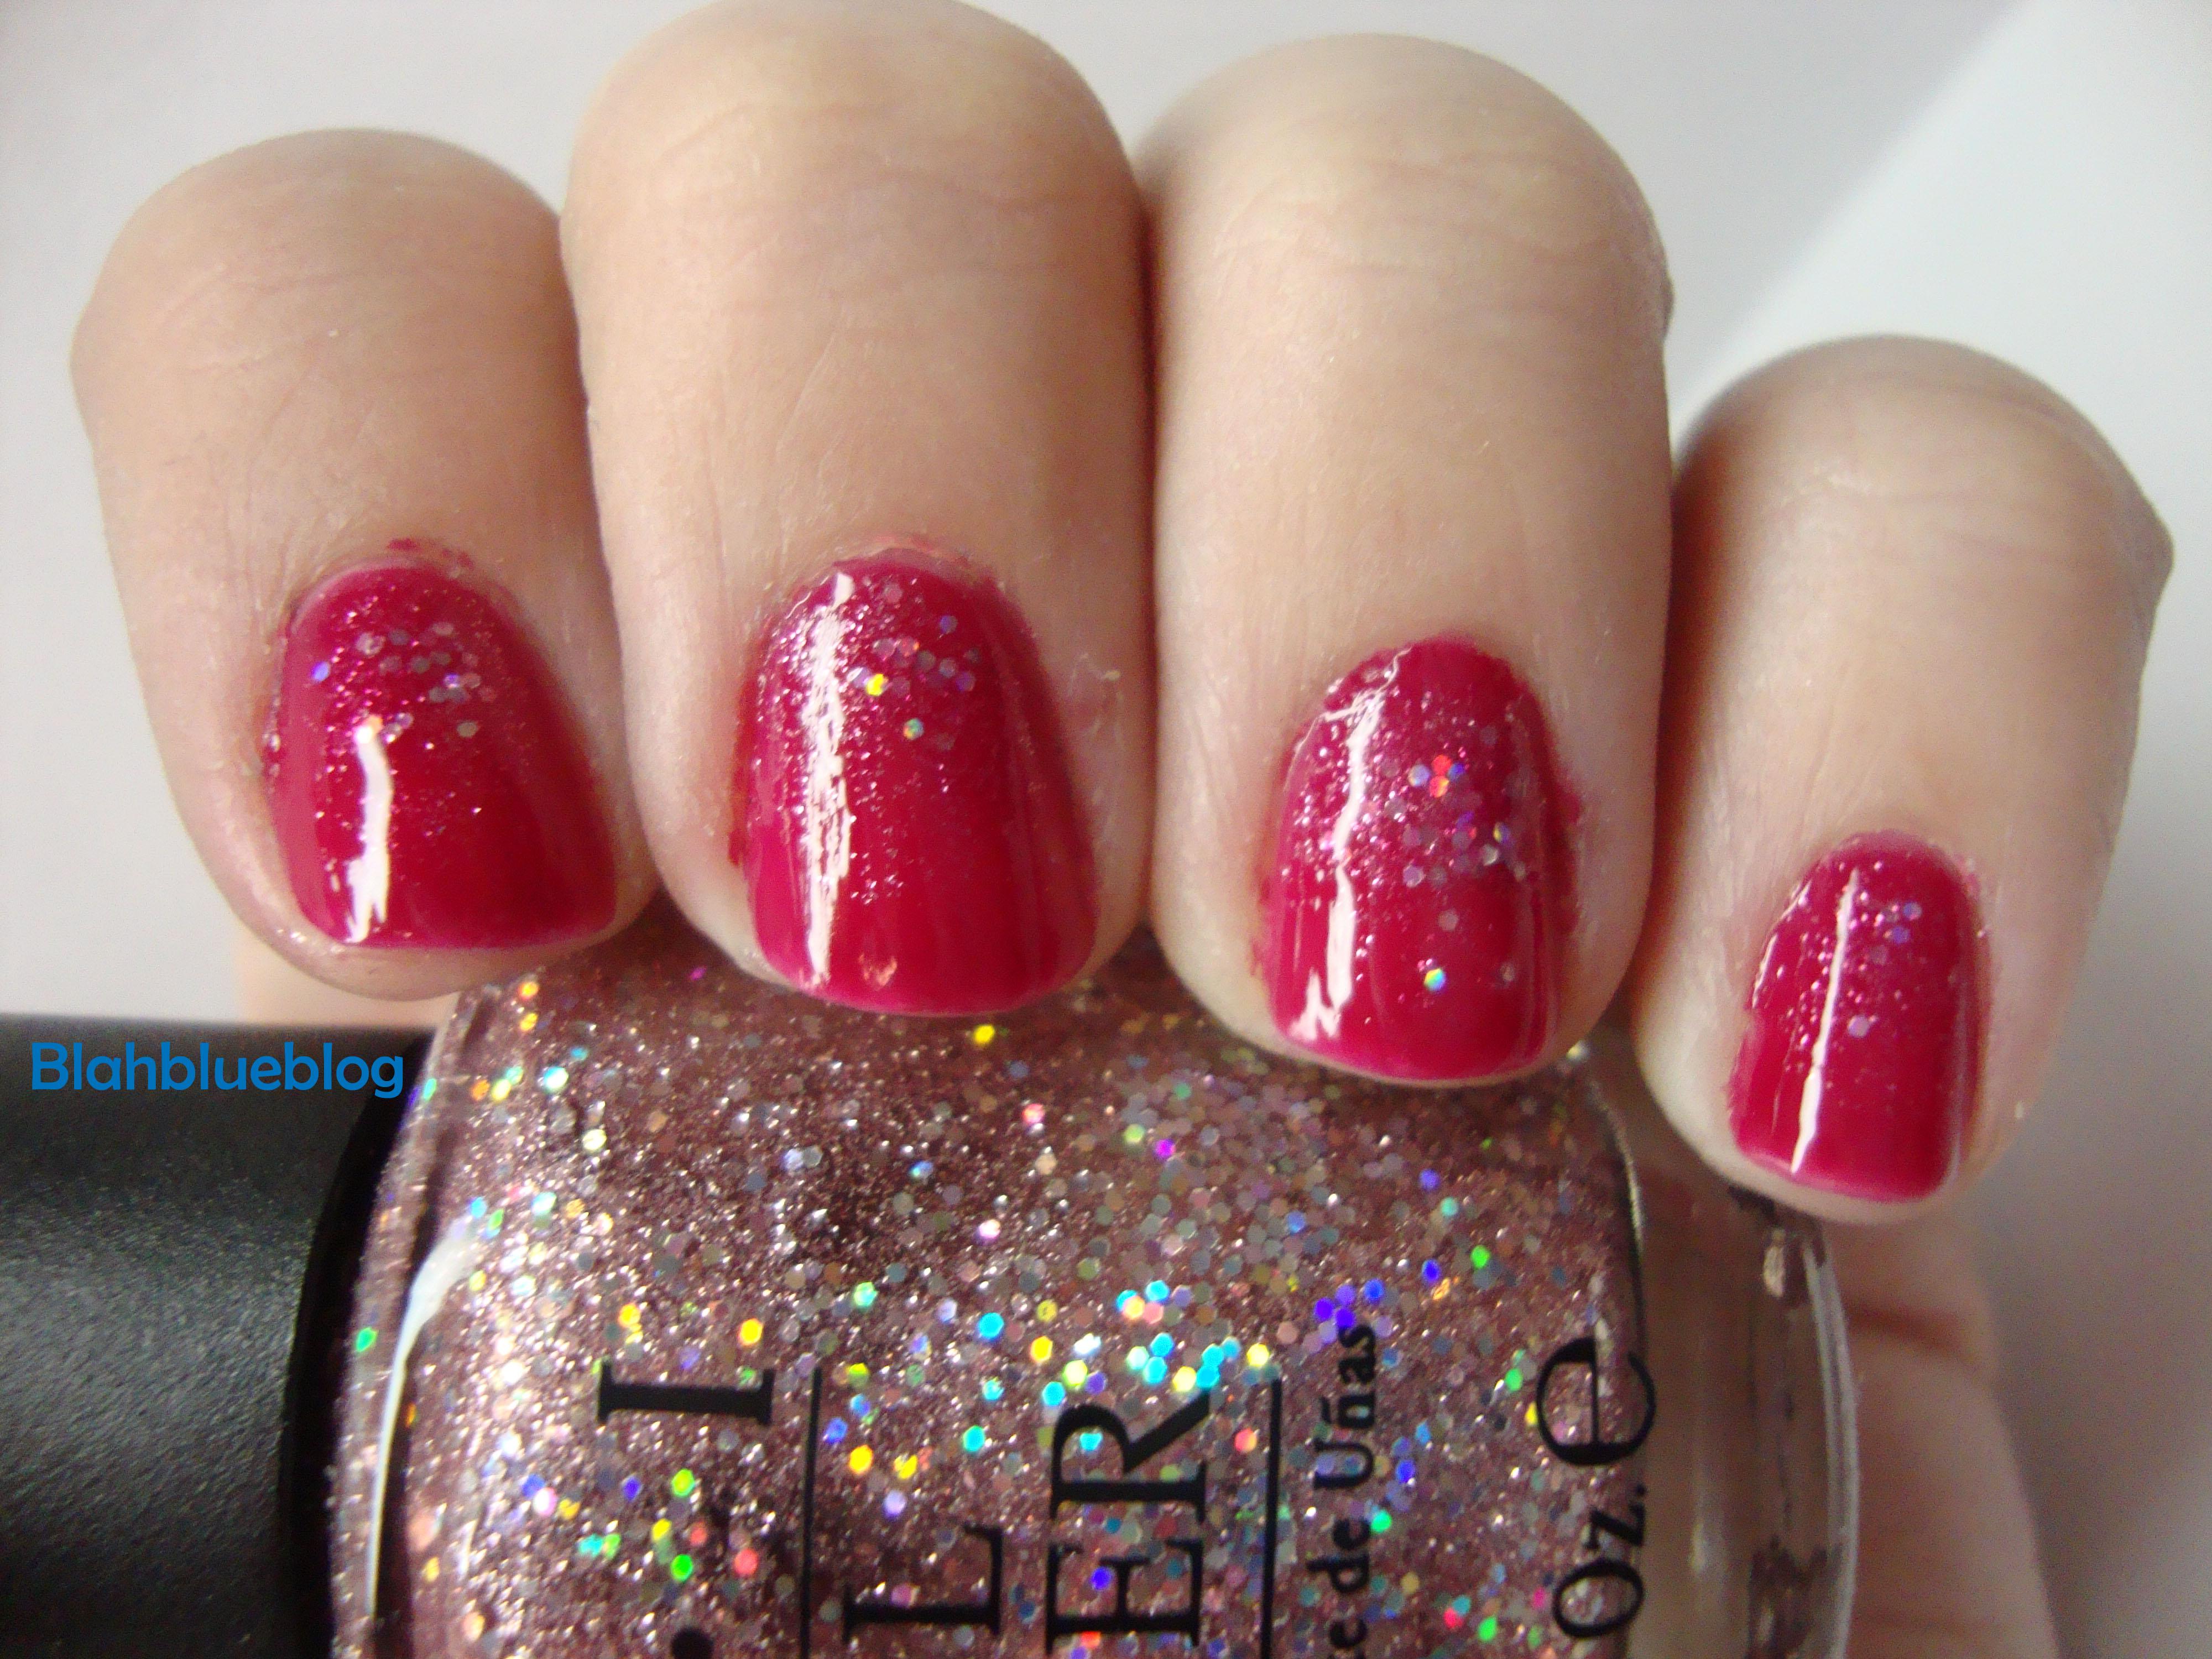 Jelly Sandwich Nail Polish | blahblueblog